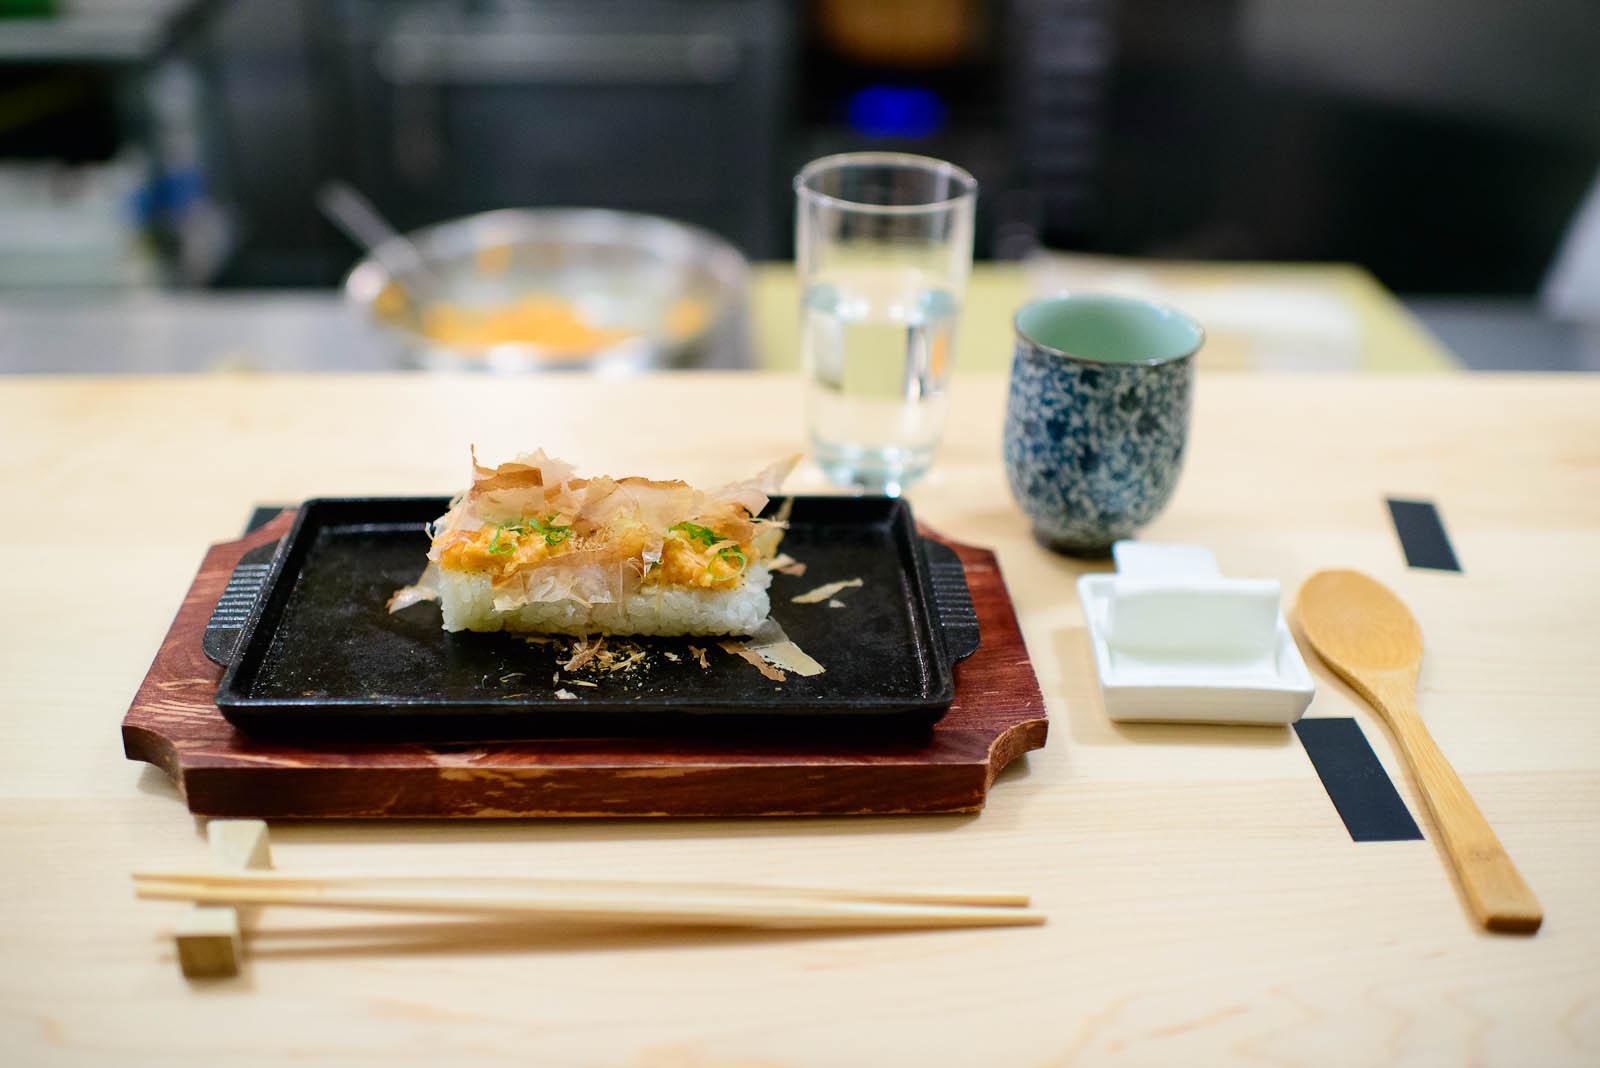 5th Course: Spicy salmon teppanyaki